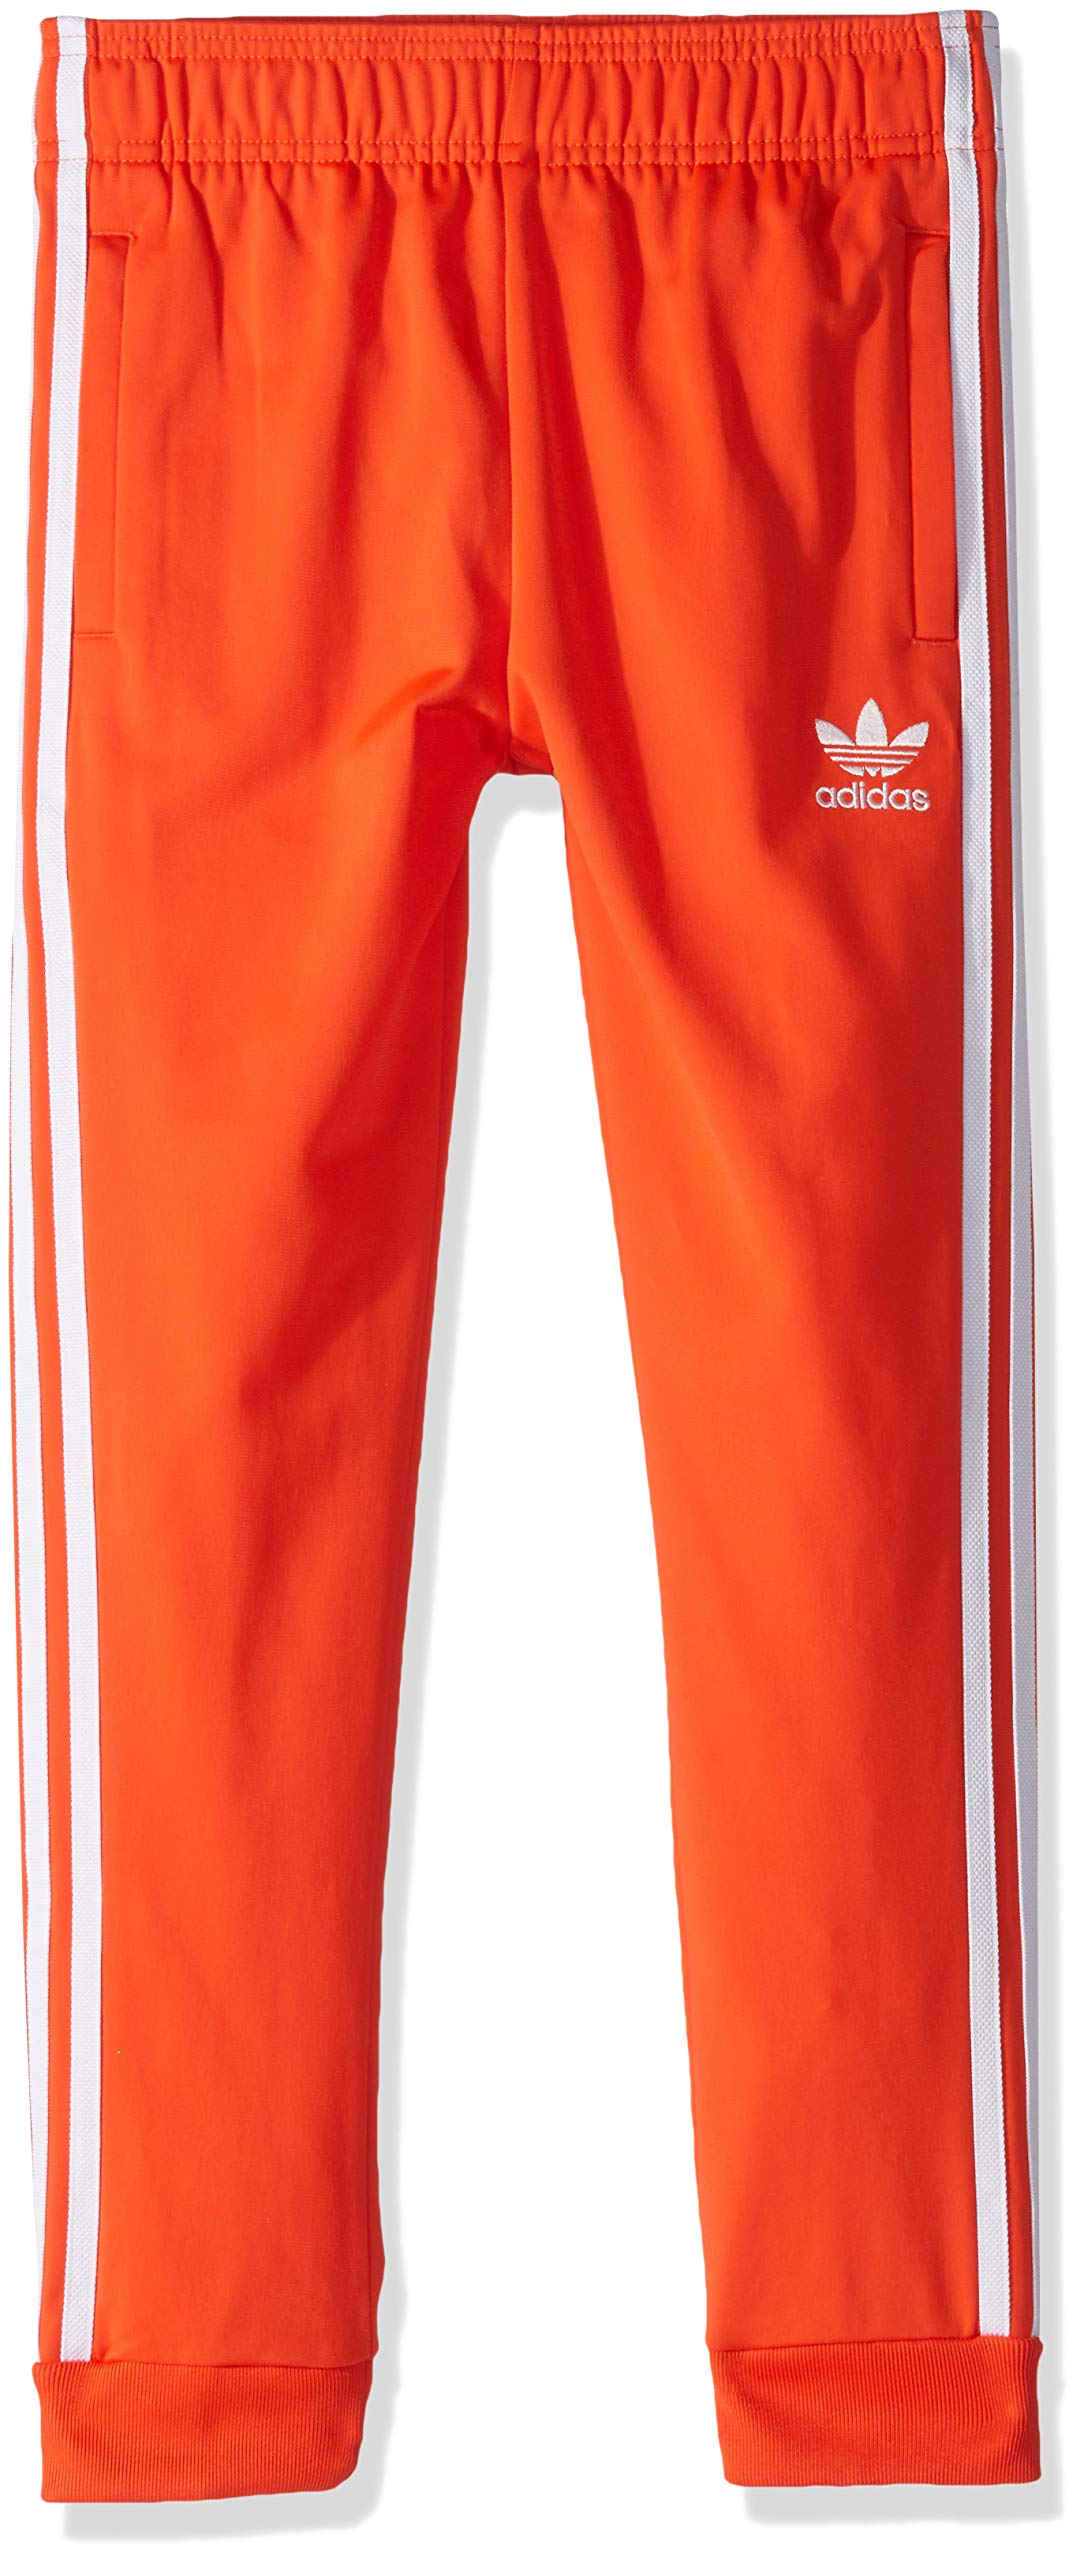 adidas Originals Boys' Big Superstar Pants, Active Orange/White, X-Large